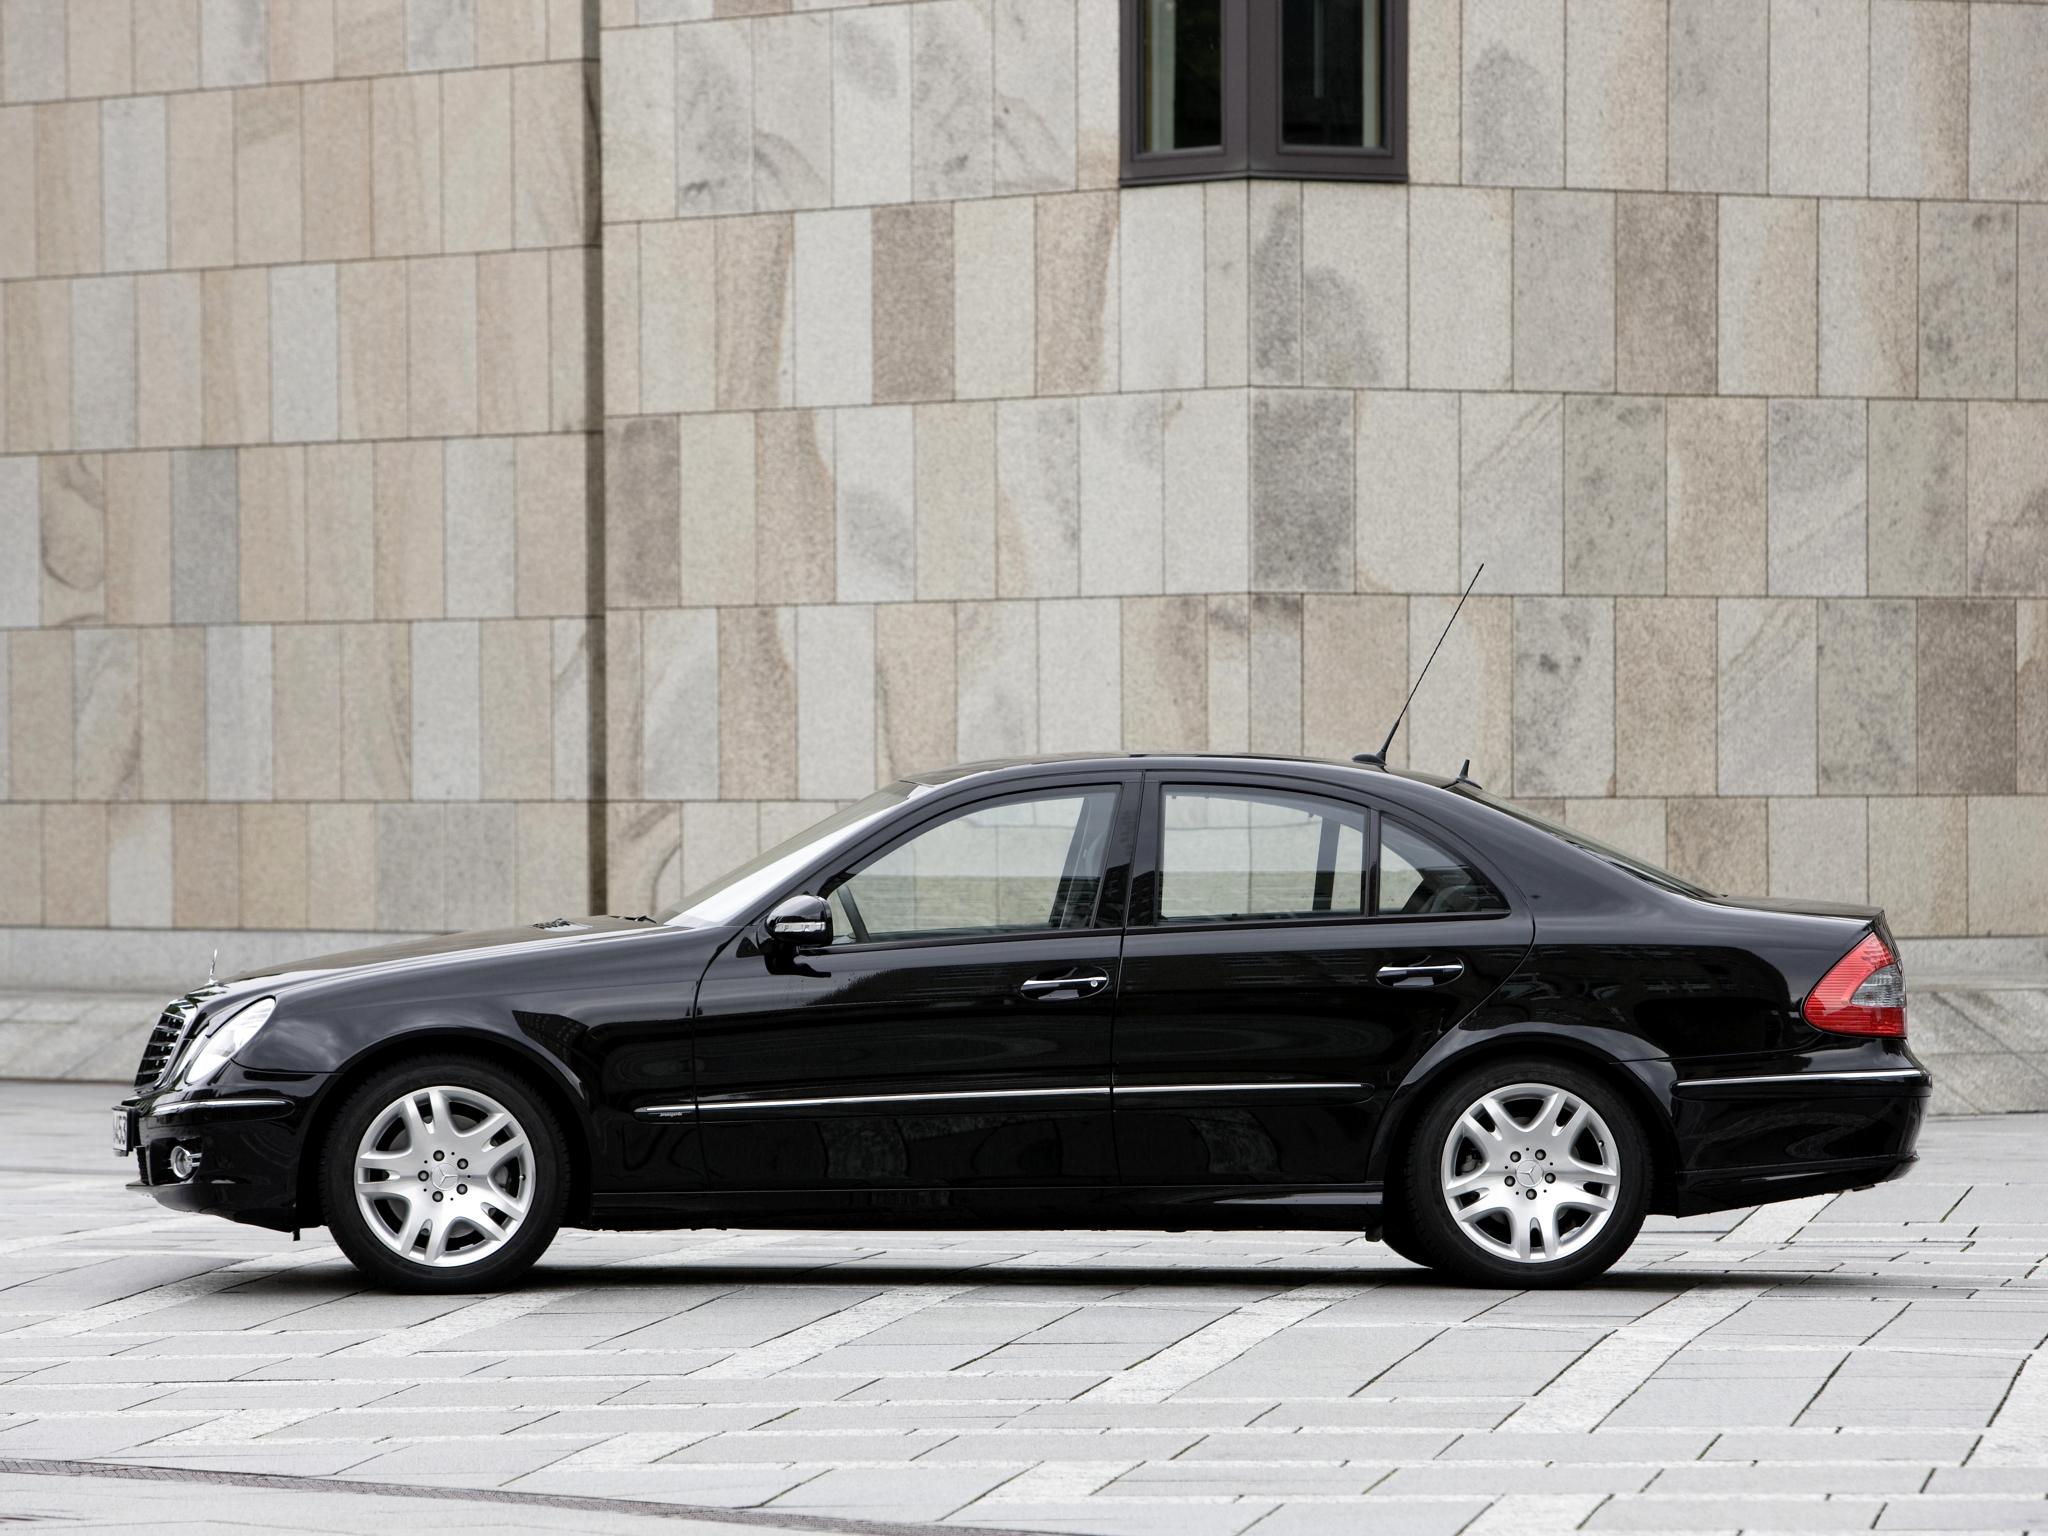 2006 armored mercedes benz e klasse guard w211 luxury g for Mercedes benz w211